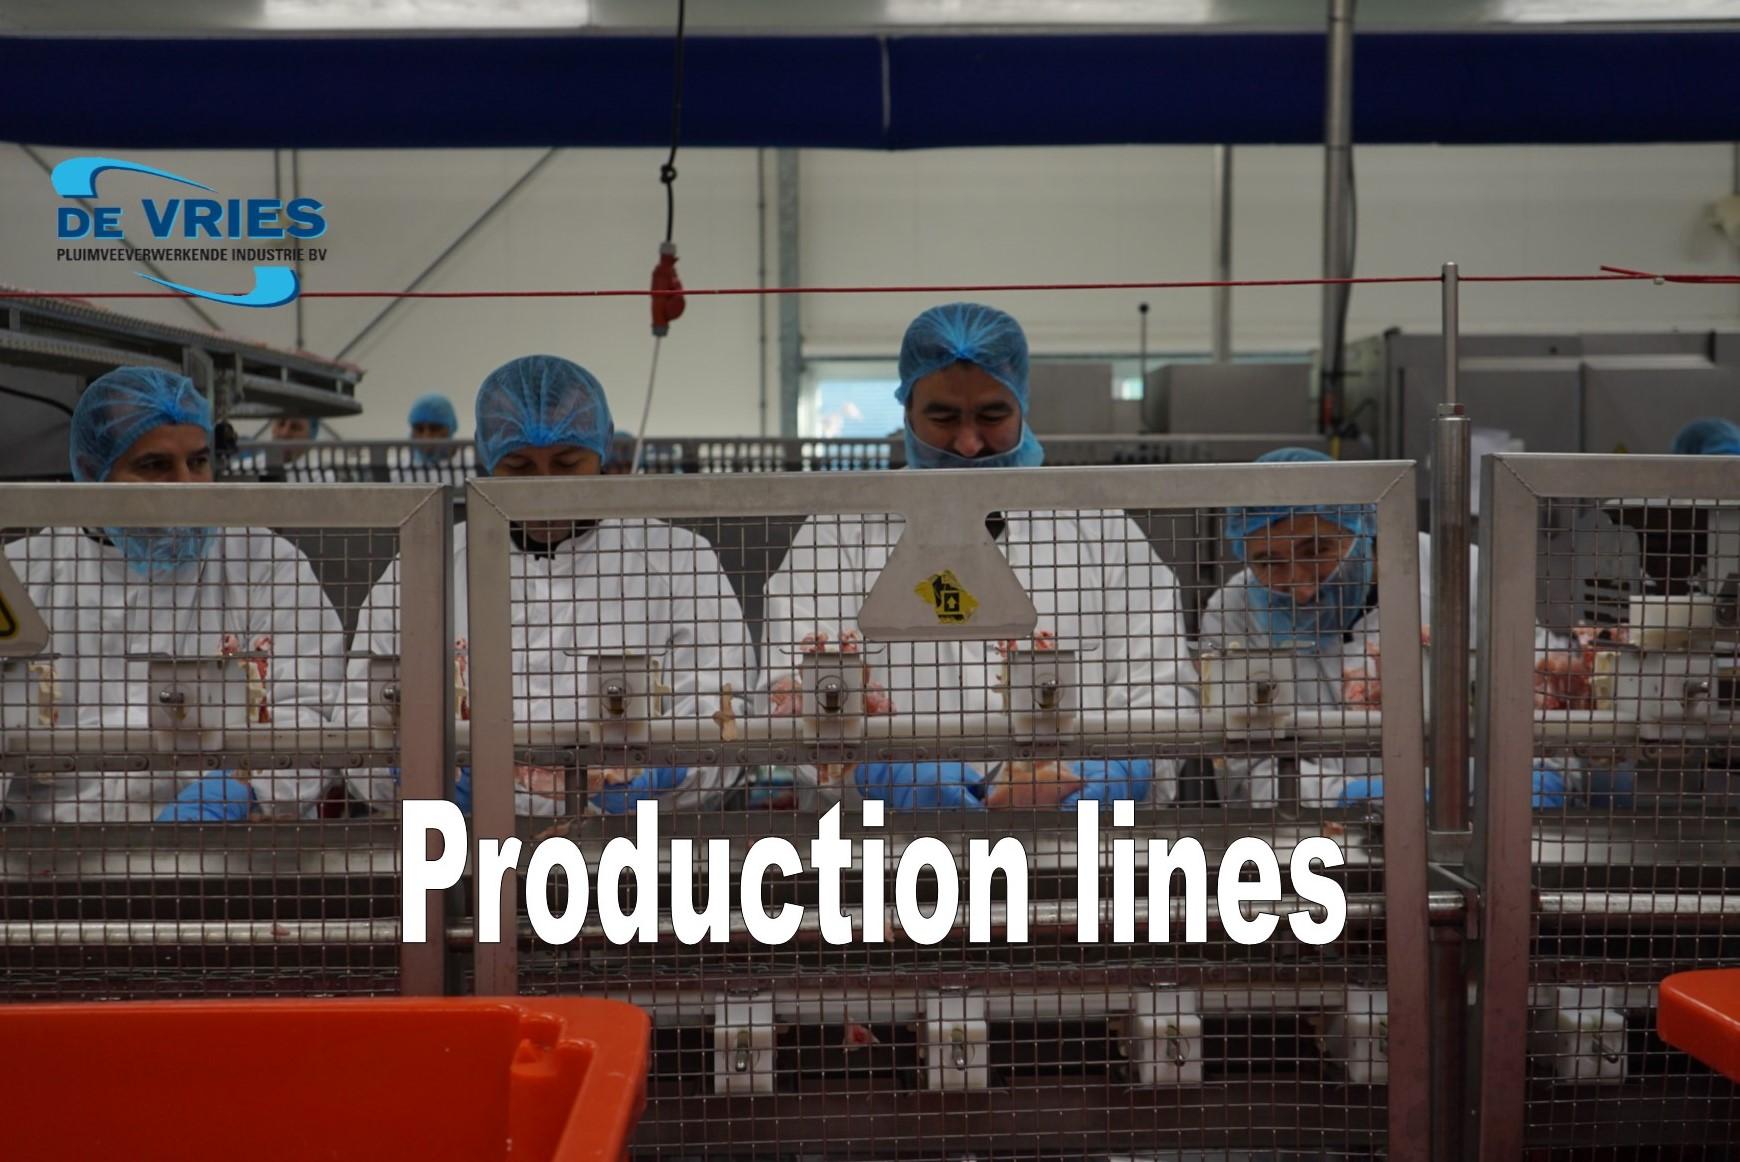 http://devriesnijkerk.nl/wp-content/uploads/2017/03/Production-lines.jpg